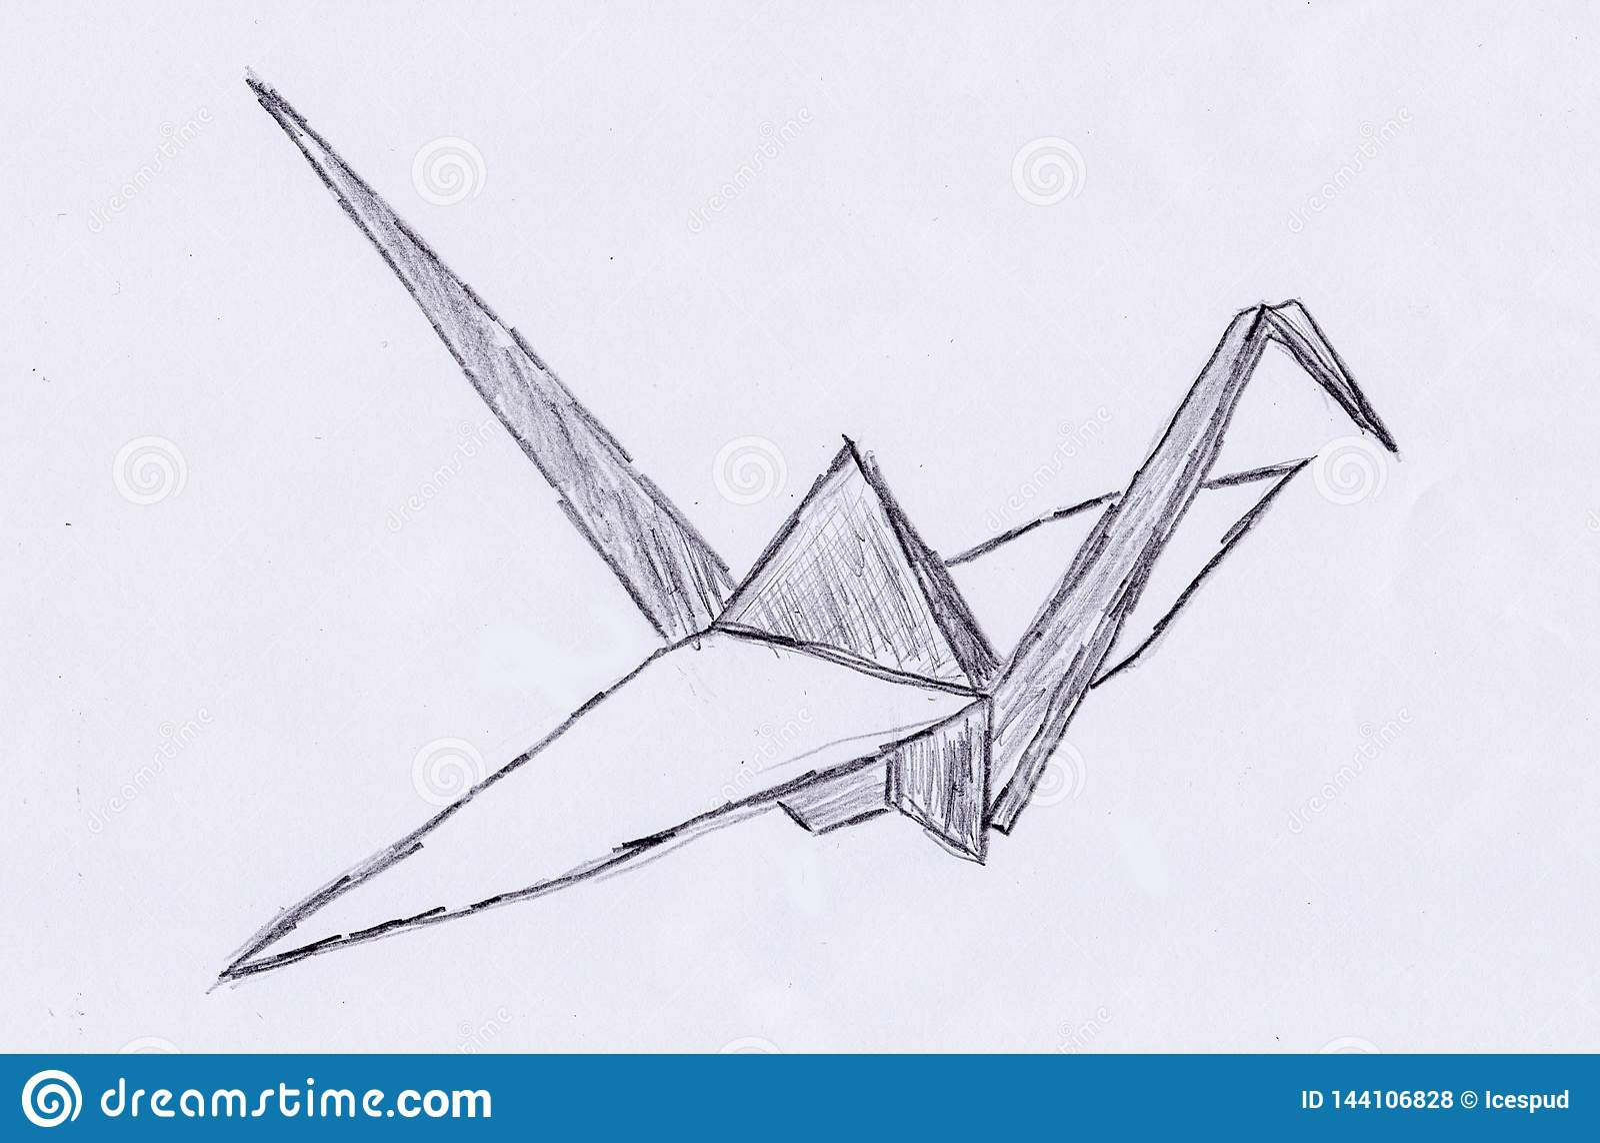 Hand Draw Of A Origami Crane Stock Illustration Illustration Of